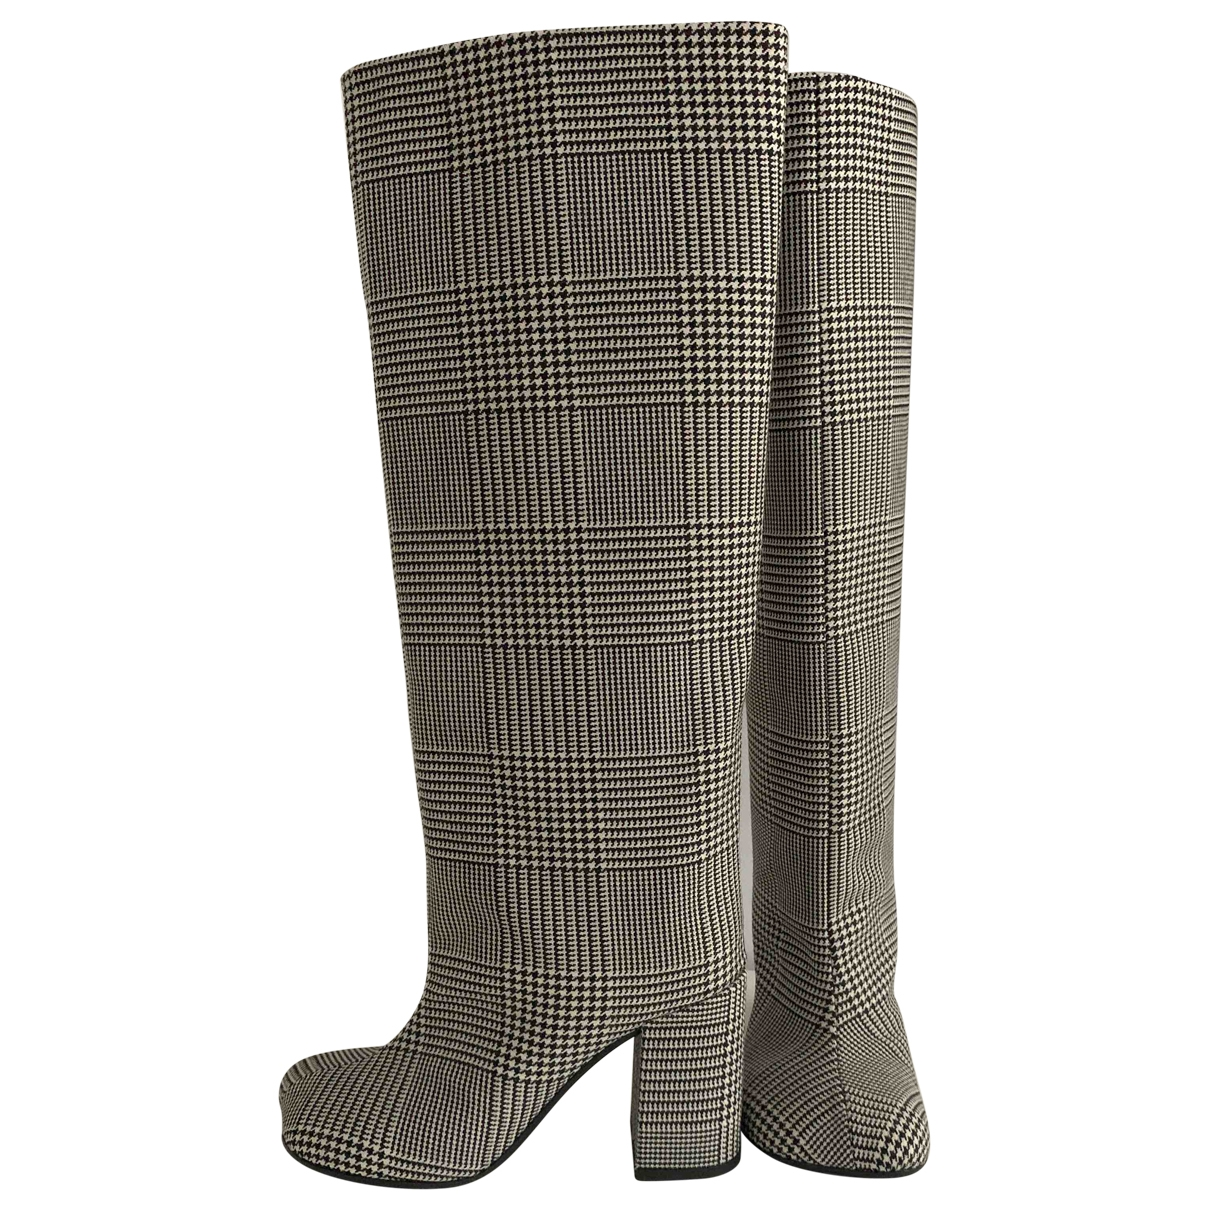 Mm6 \N Stiefel in  Grau Leder